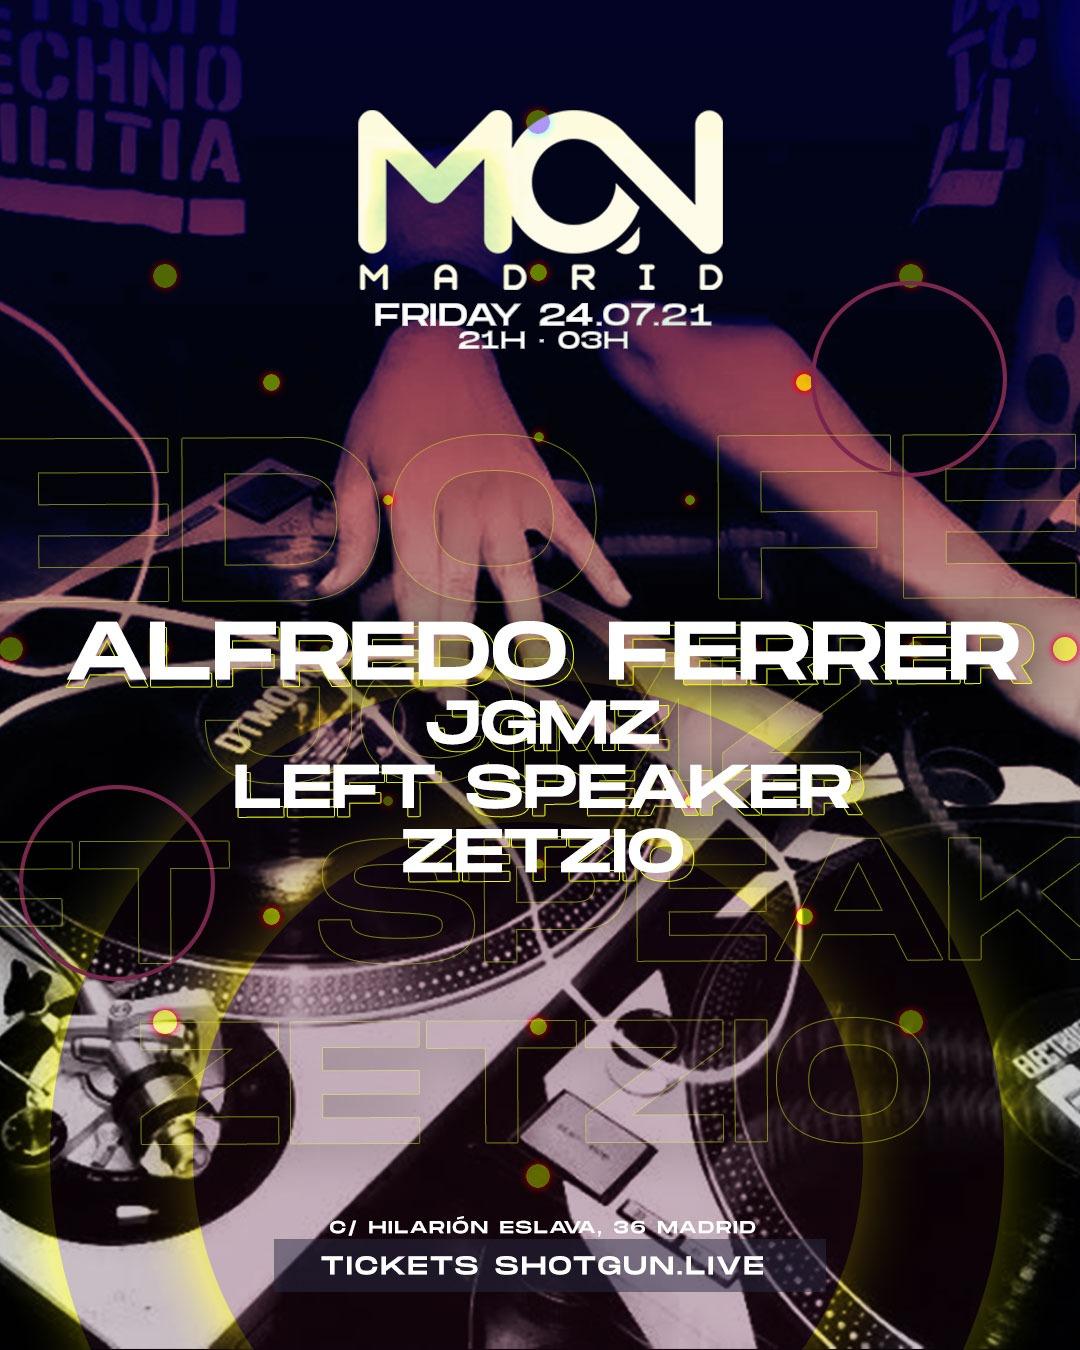 Alfredo Ferrer, JGMZ, Left Speaker & ZETZIO @ Mon Club Madrid